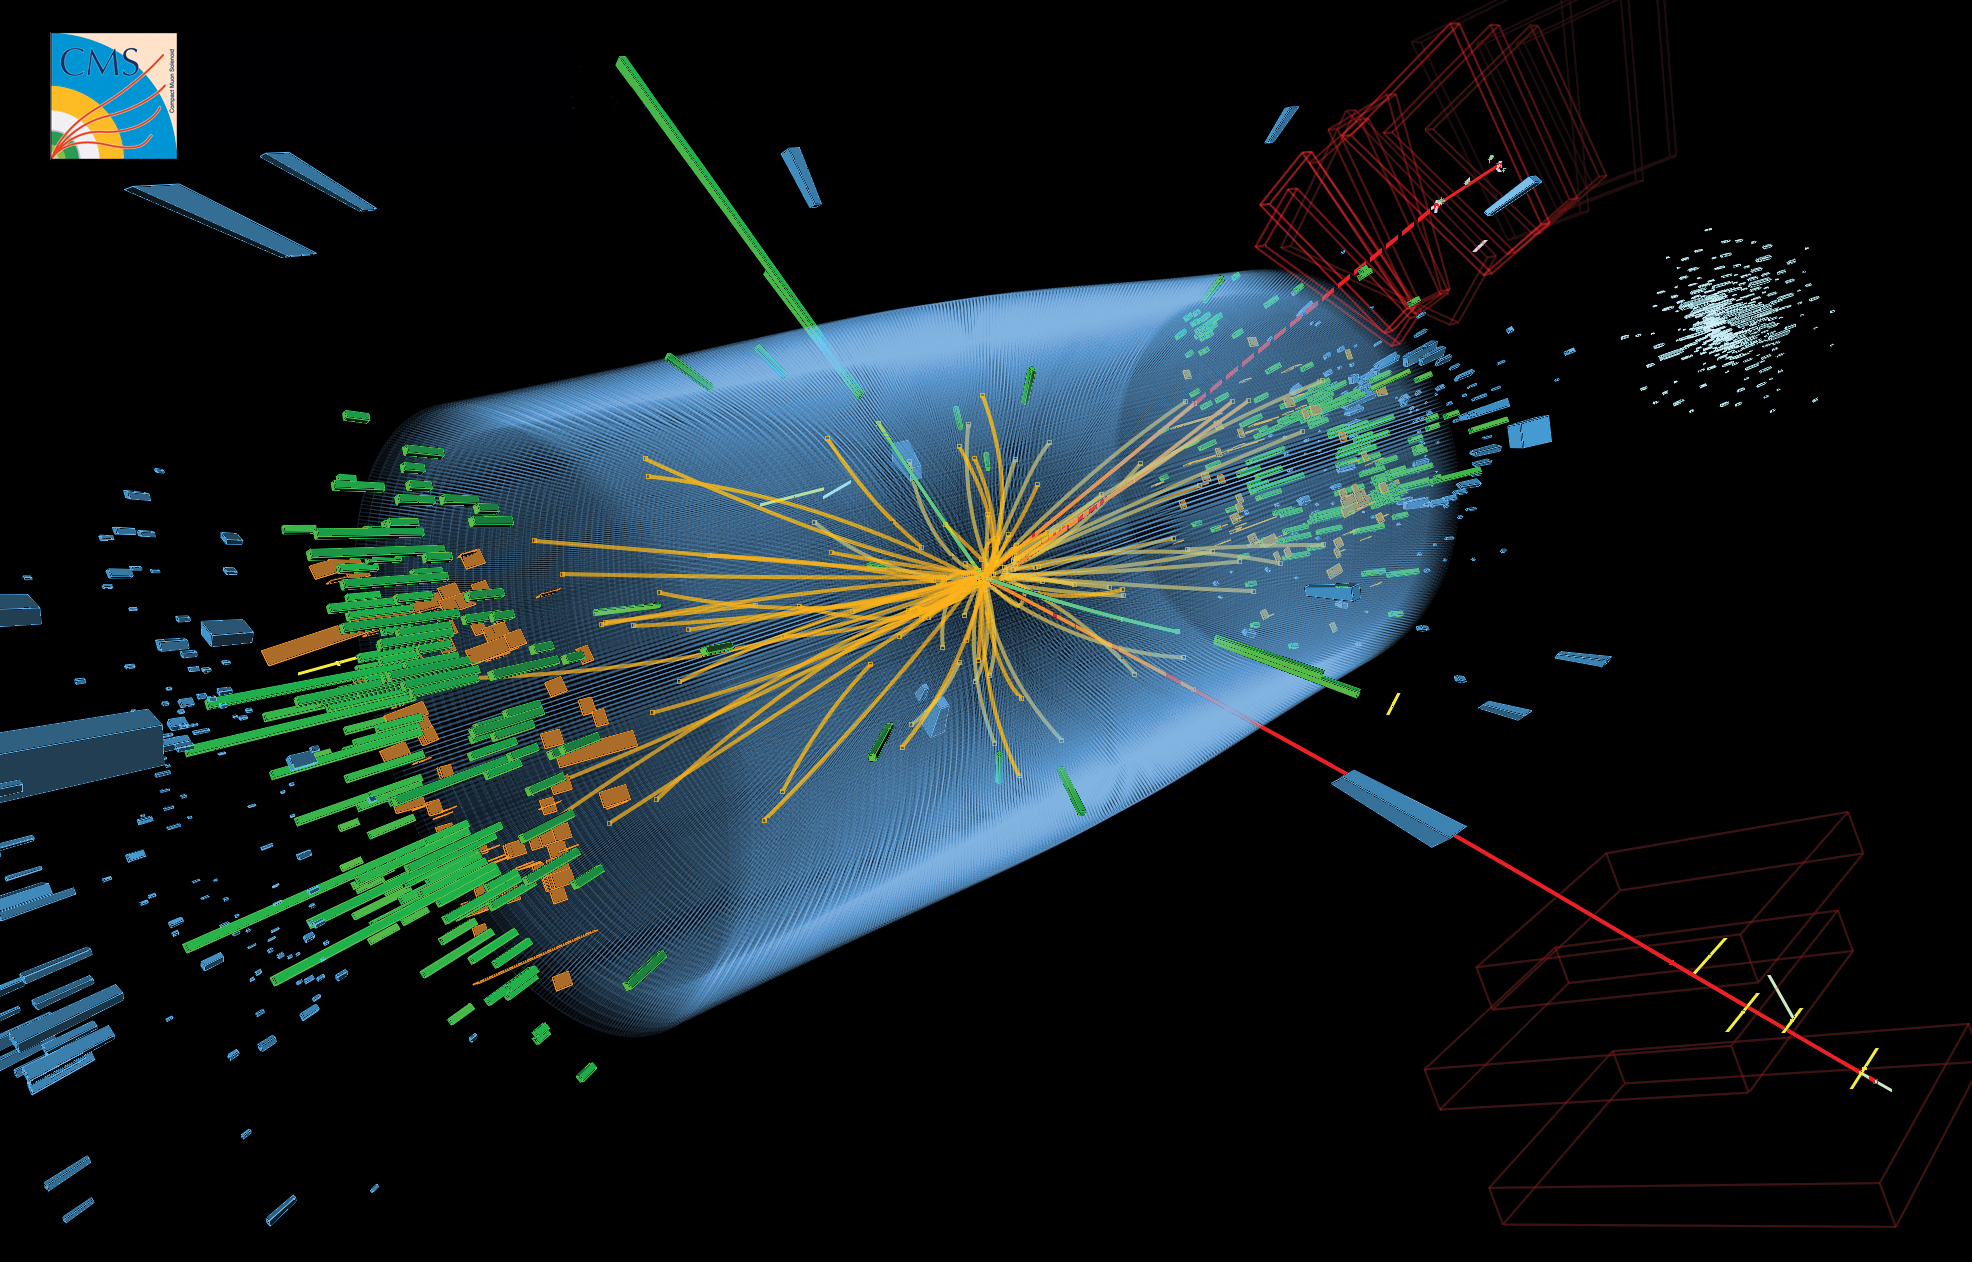 Evidence of Higgs boson